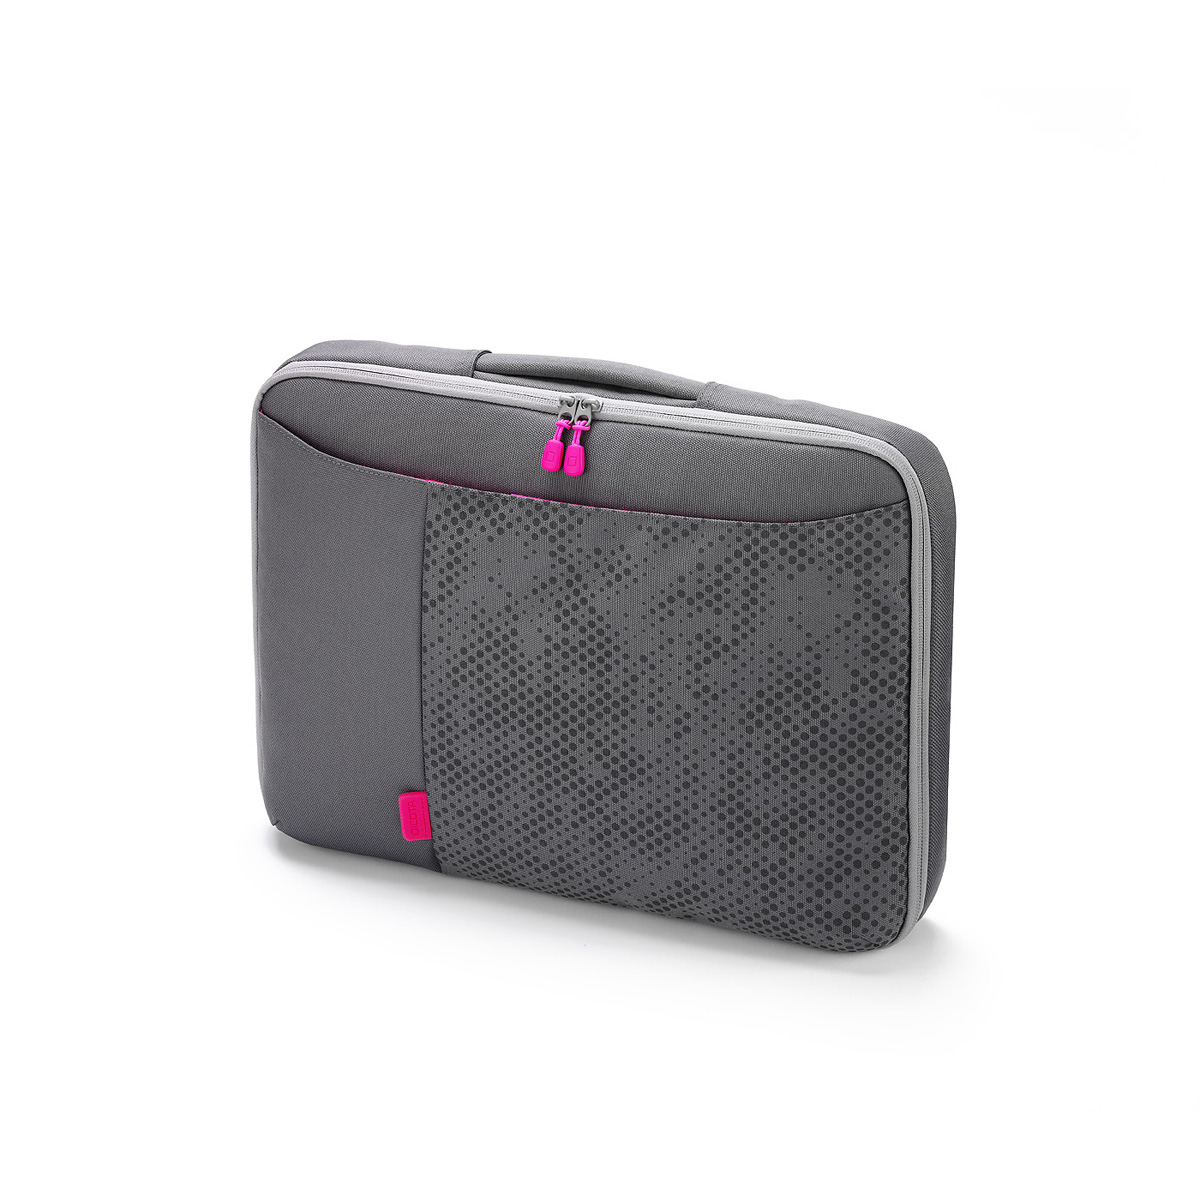 dicota bounce slimcase 15 16 coloris gris rose sac. Black Bedroom Furniture Sets. Home Design Ideas